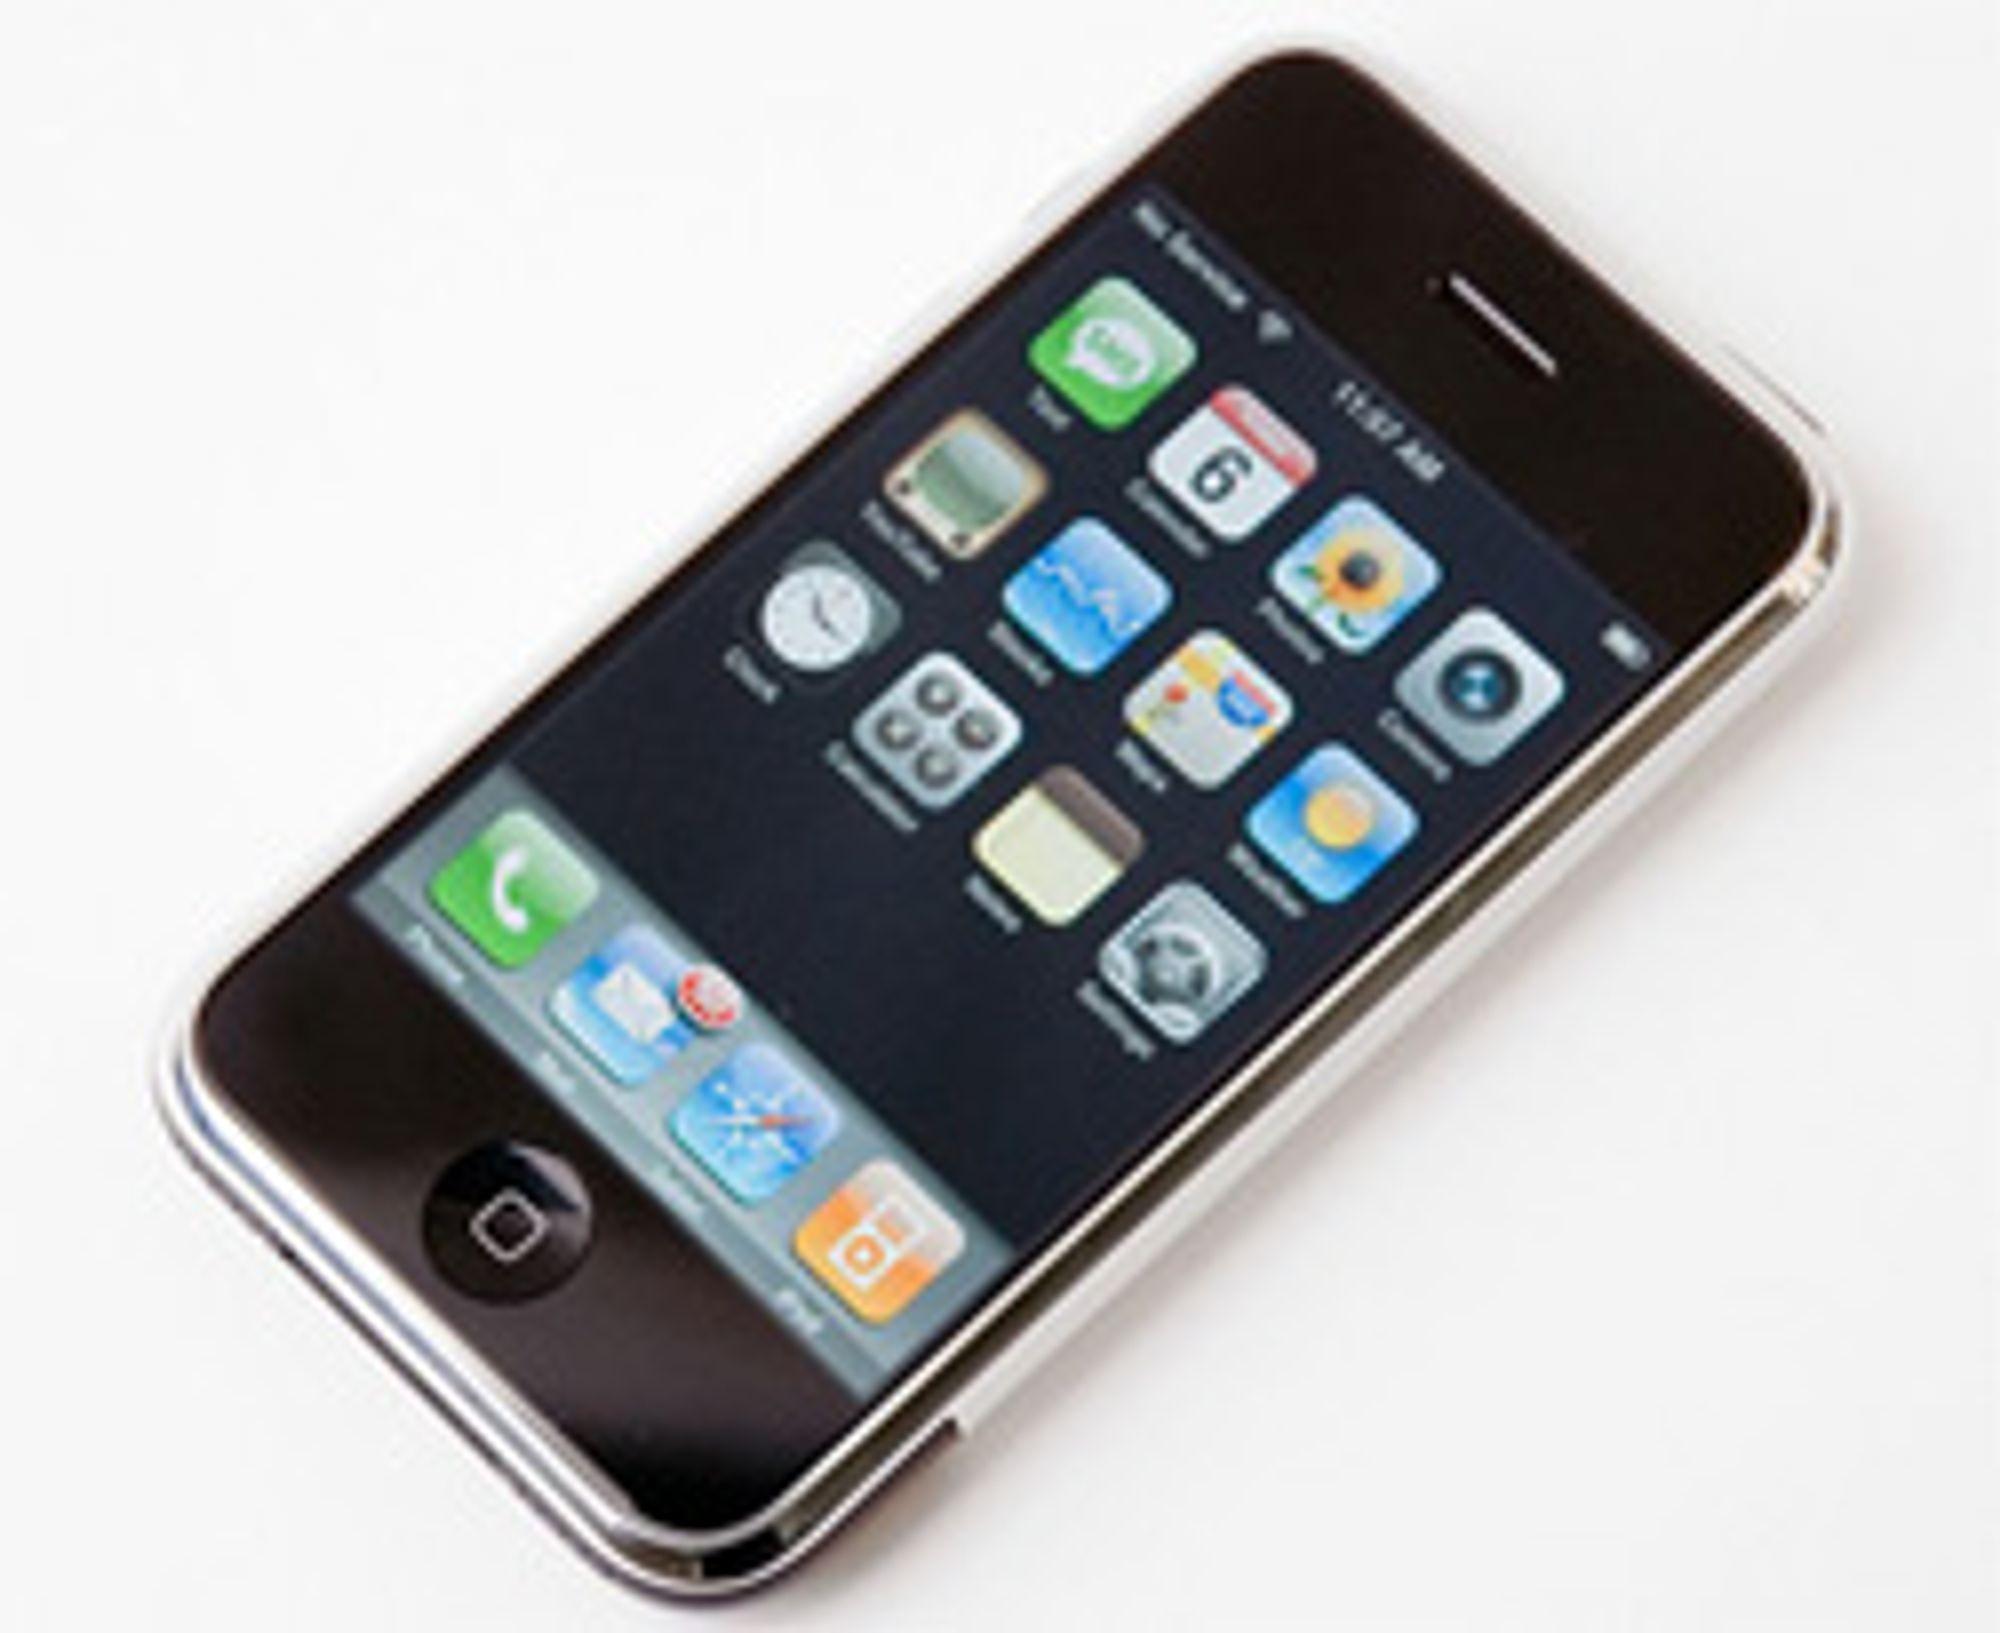 Iphone får fast månedspris i Tyskland. (Foto: Simen J. Willgohs)